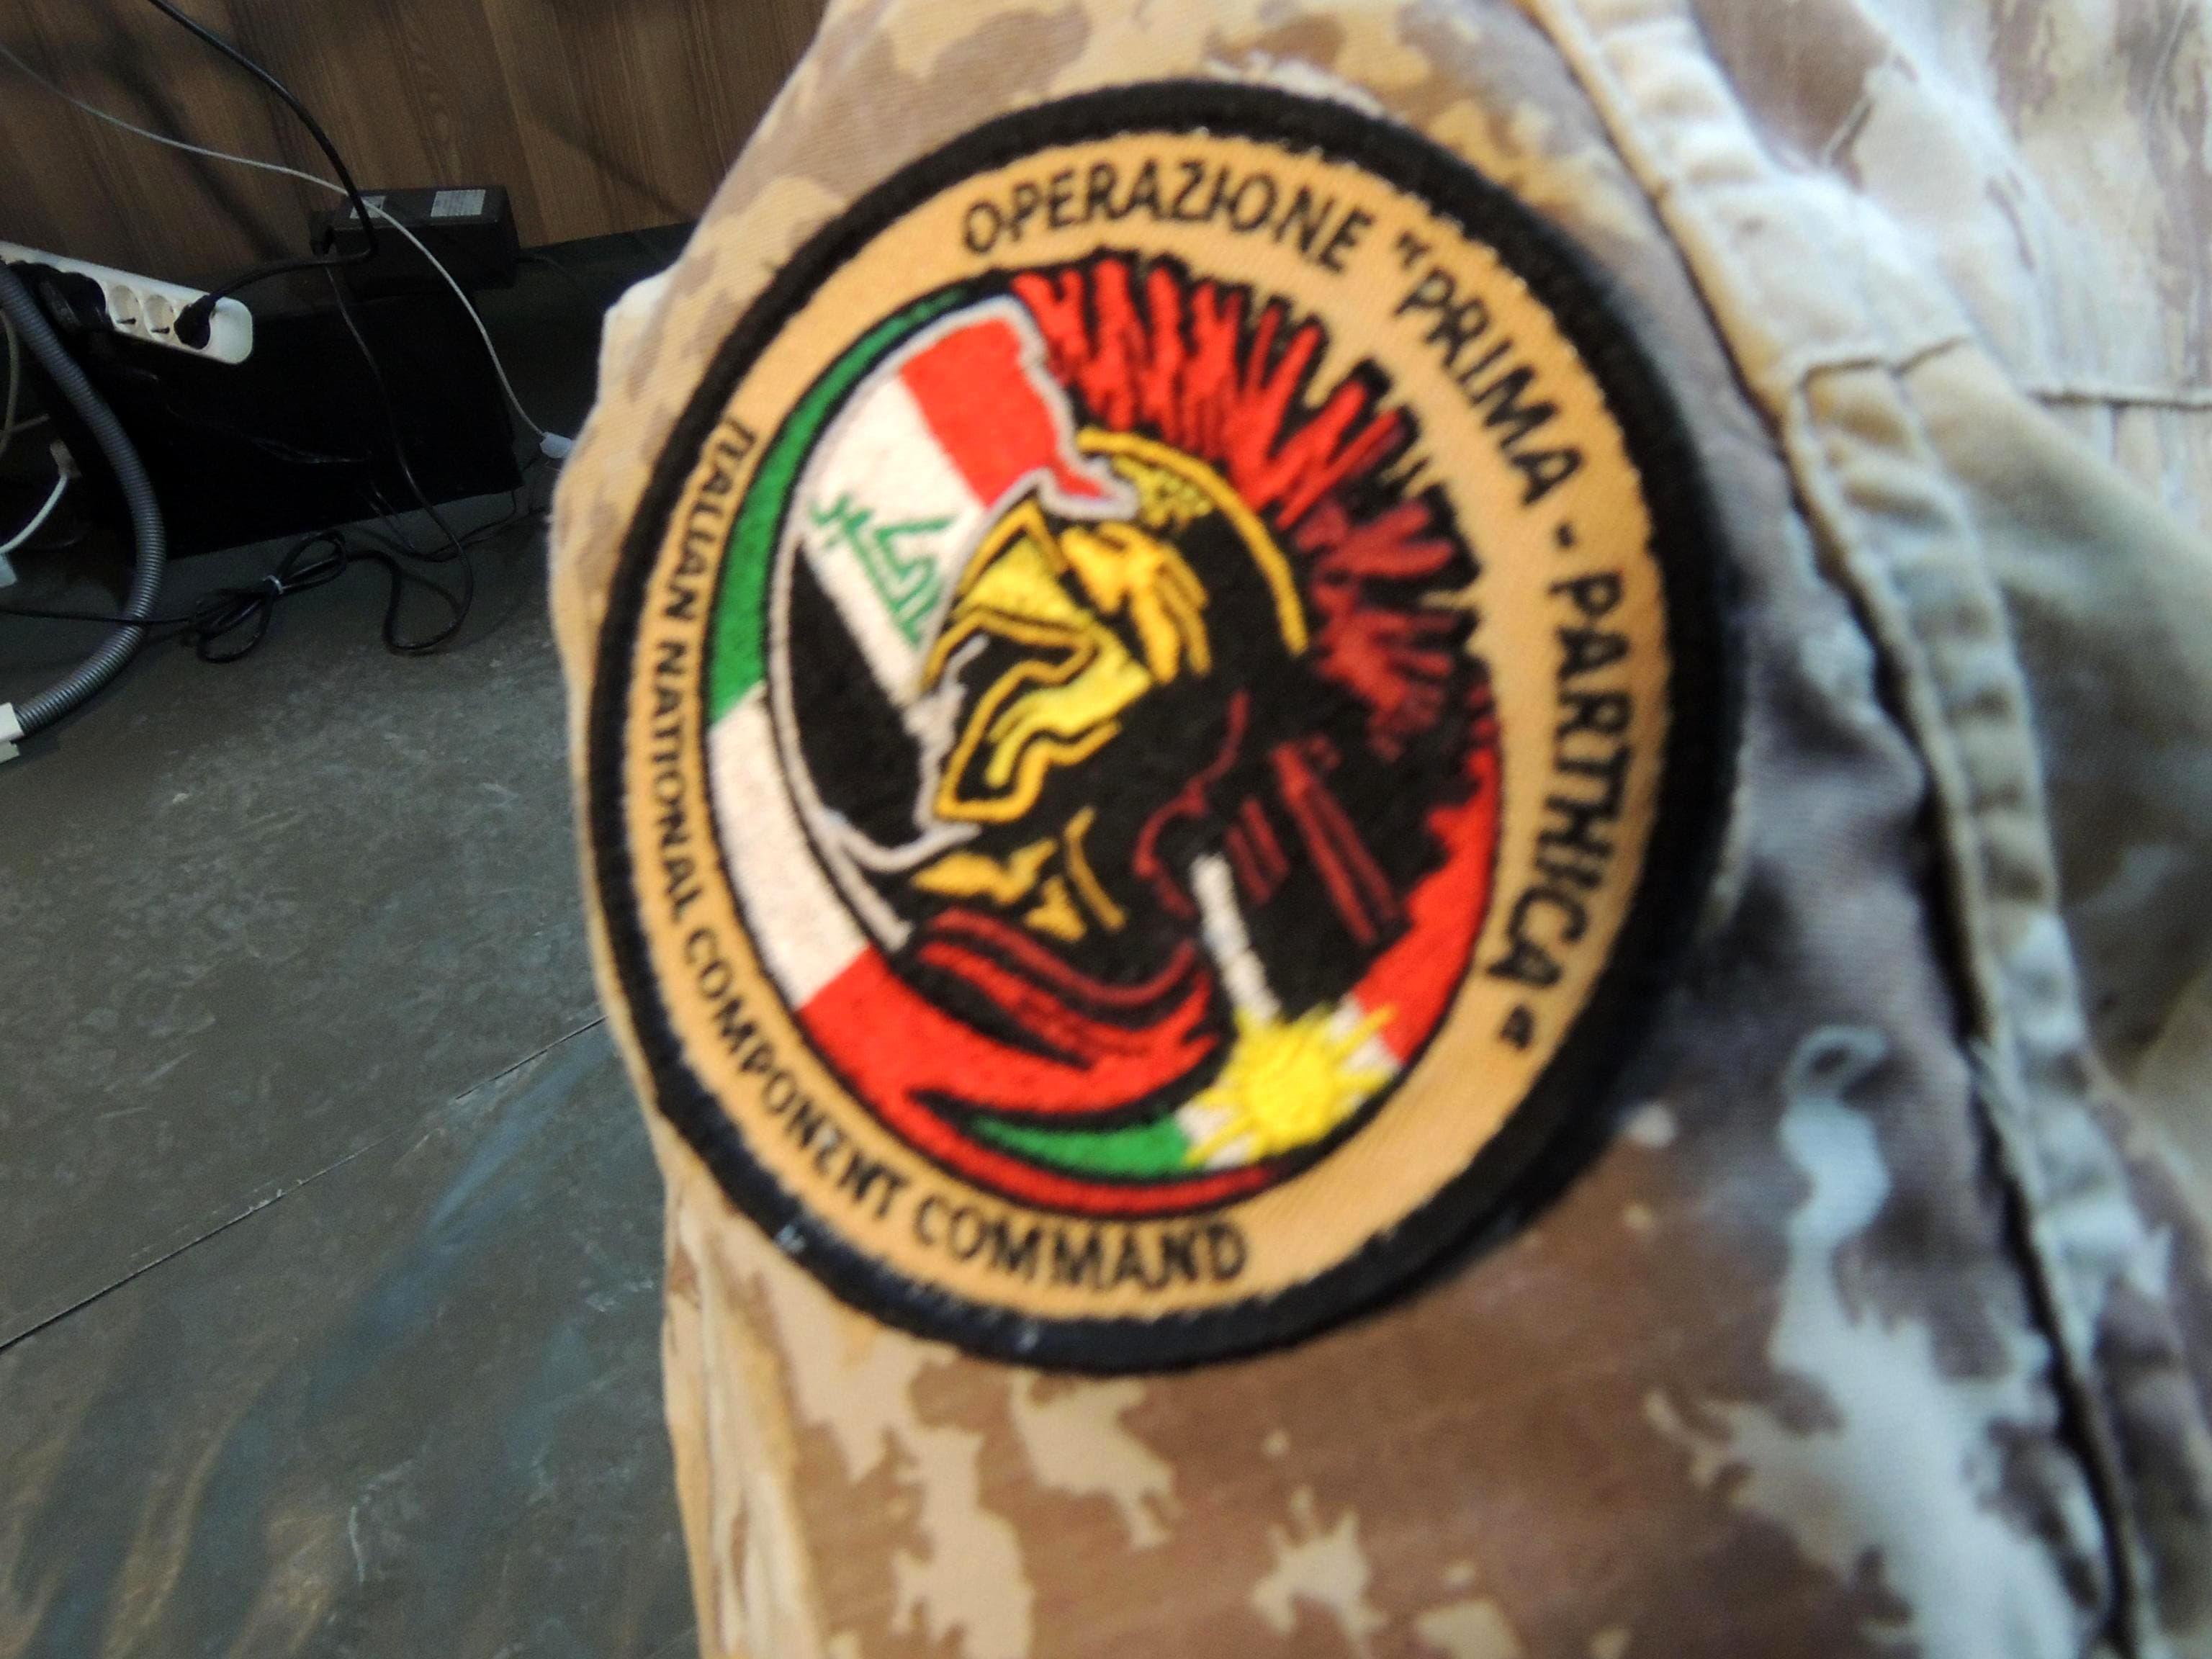 esercito italiano iraq ansa-2